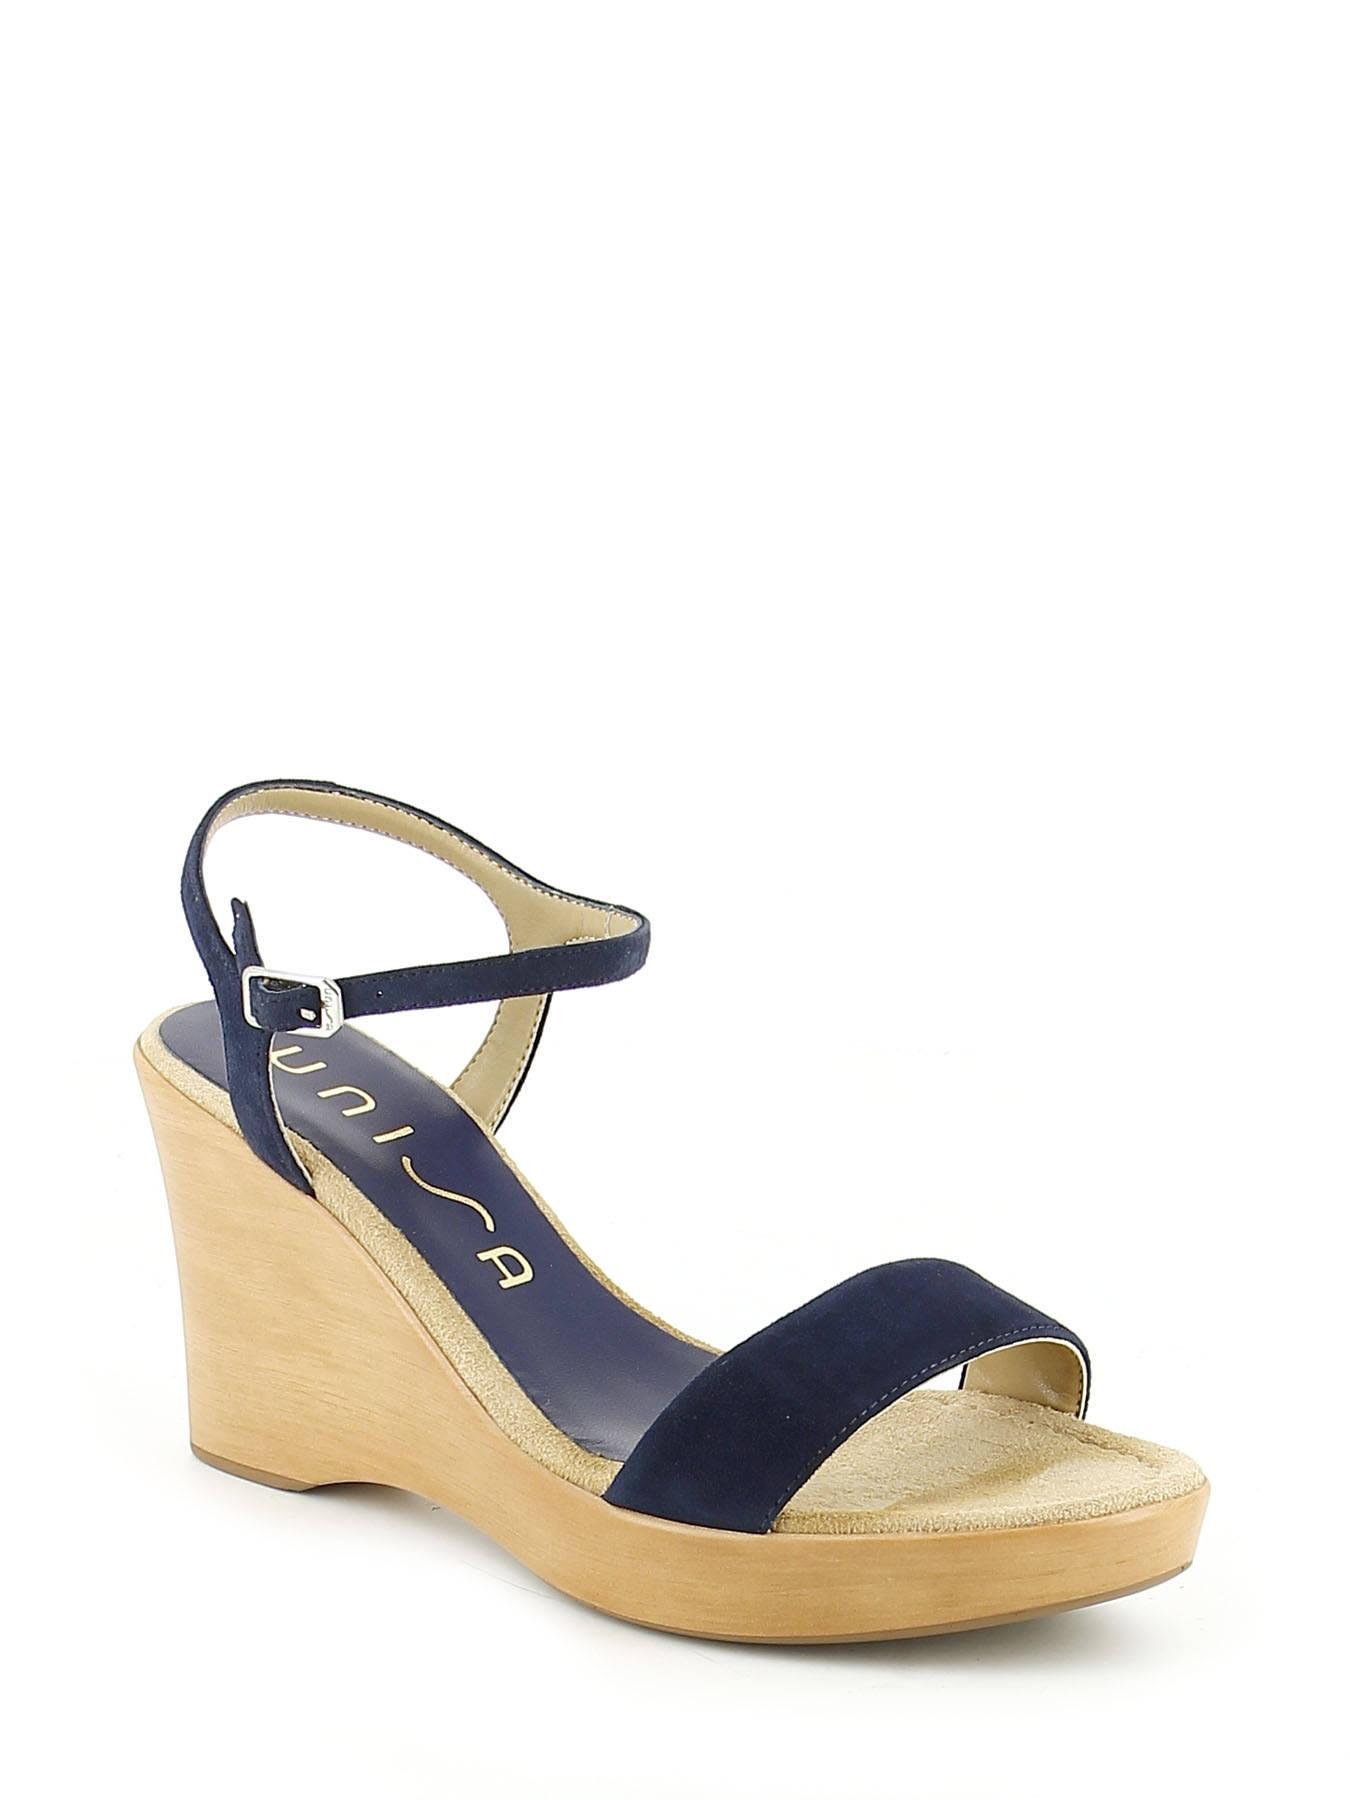 1d05057fcb2804 ... Sandals Wedge Heel Unisa Blue sandales   nu-pieds RITA-KS ...